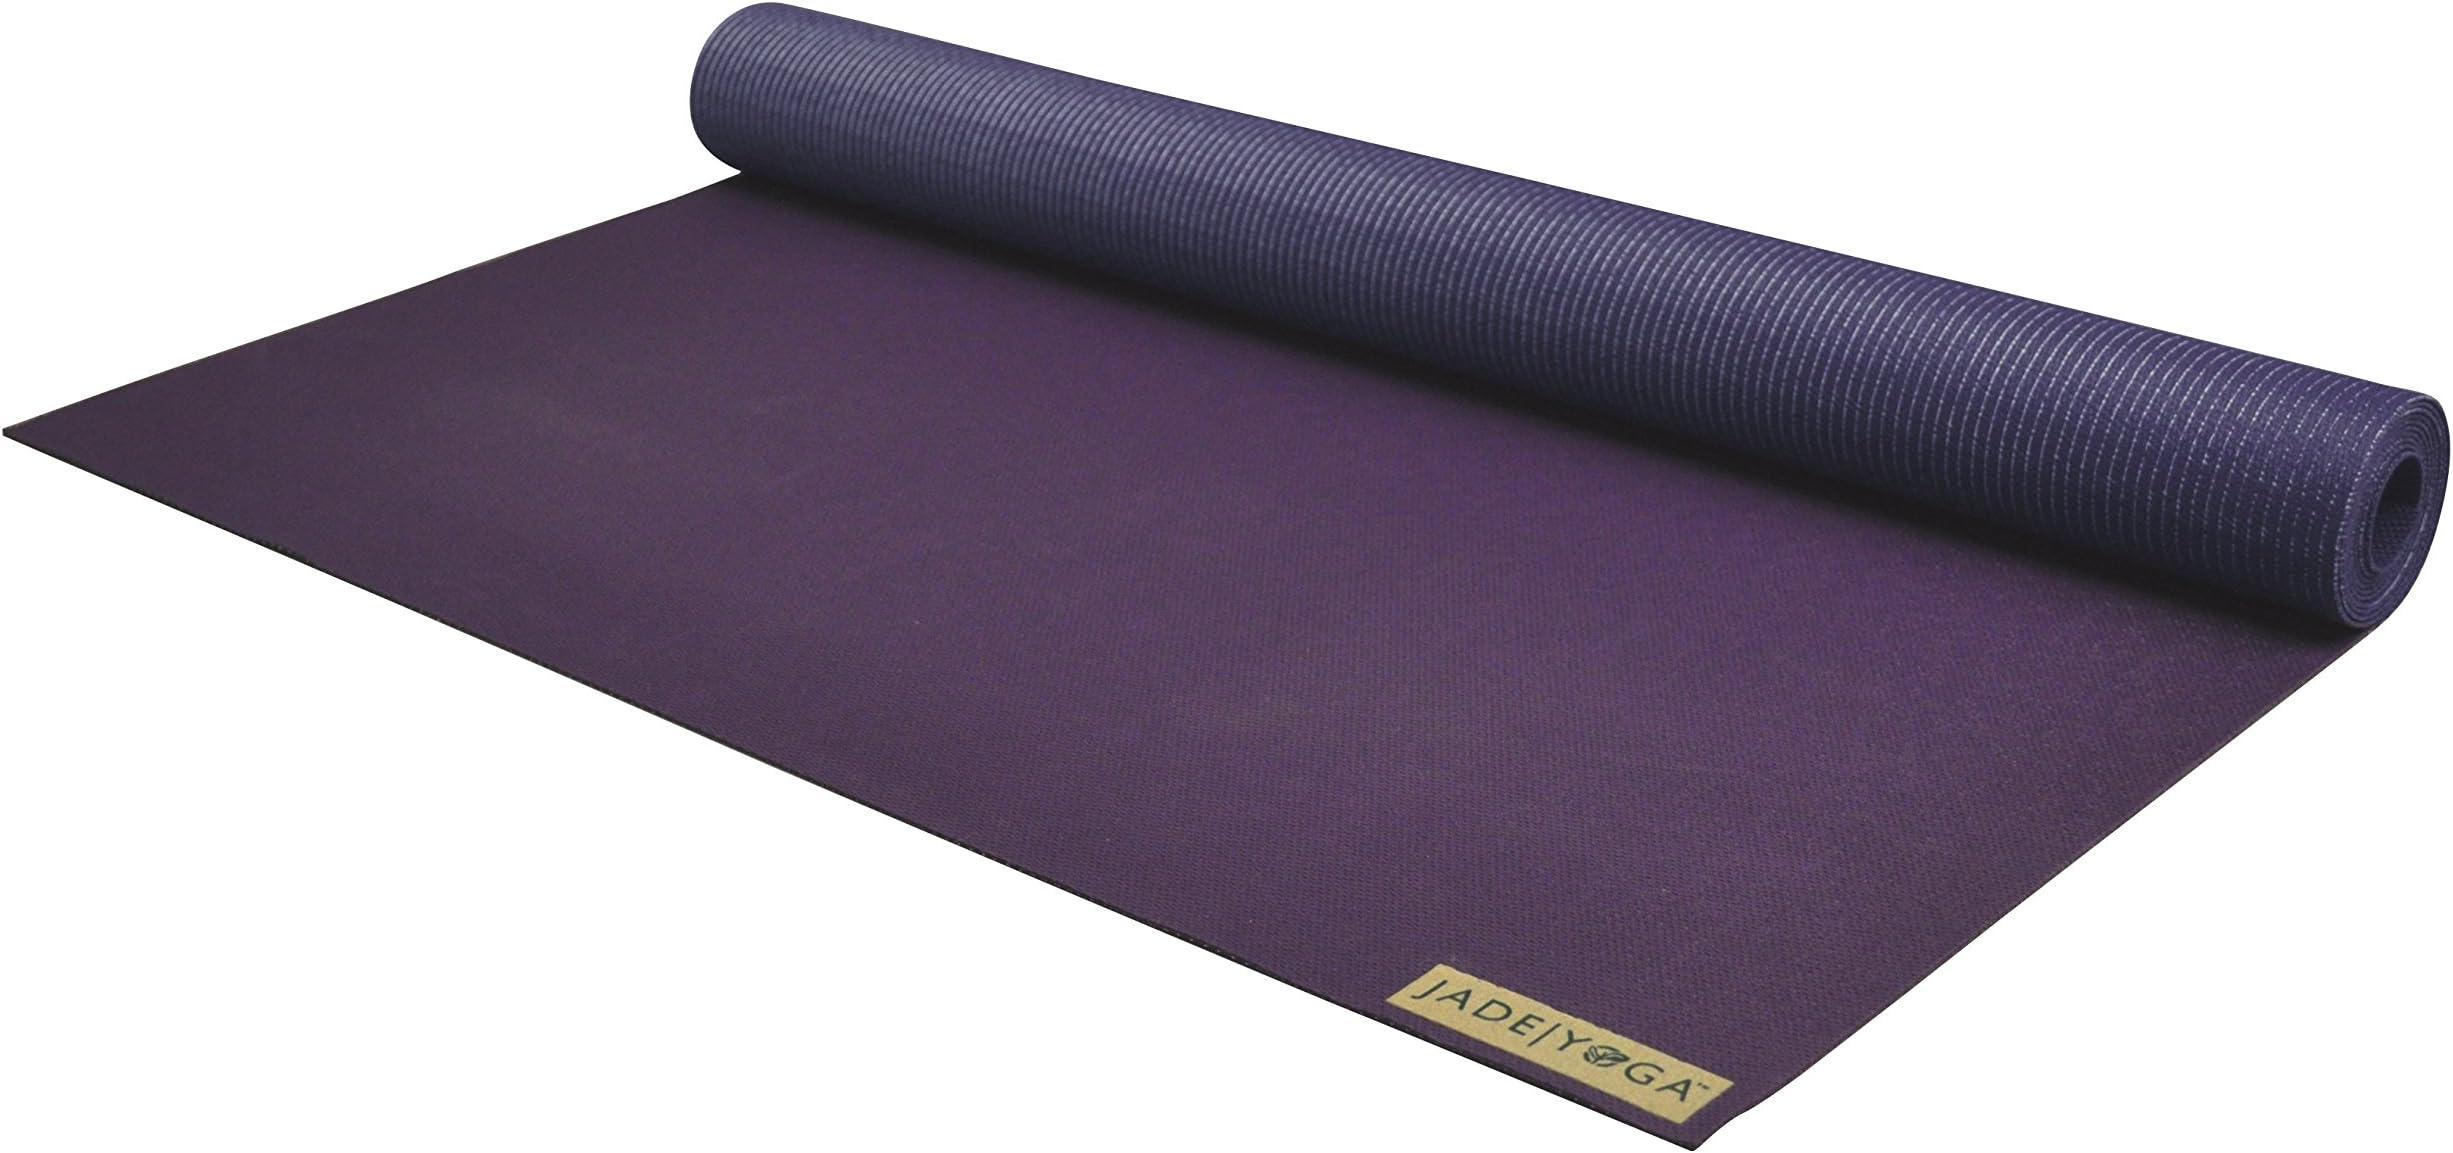 Jade Yoga - Voyager Yoga Mat (68 Inch) (Purple)